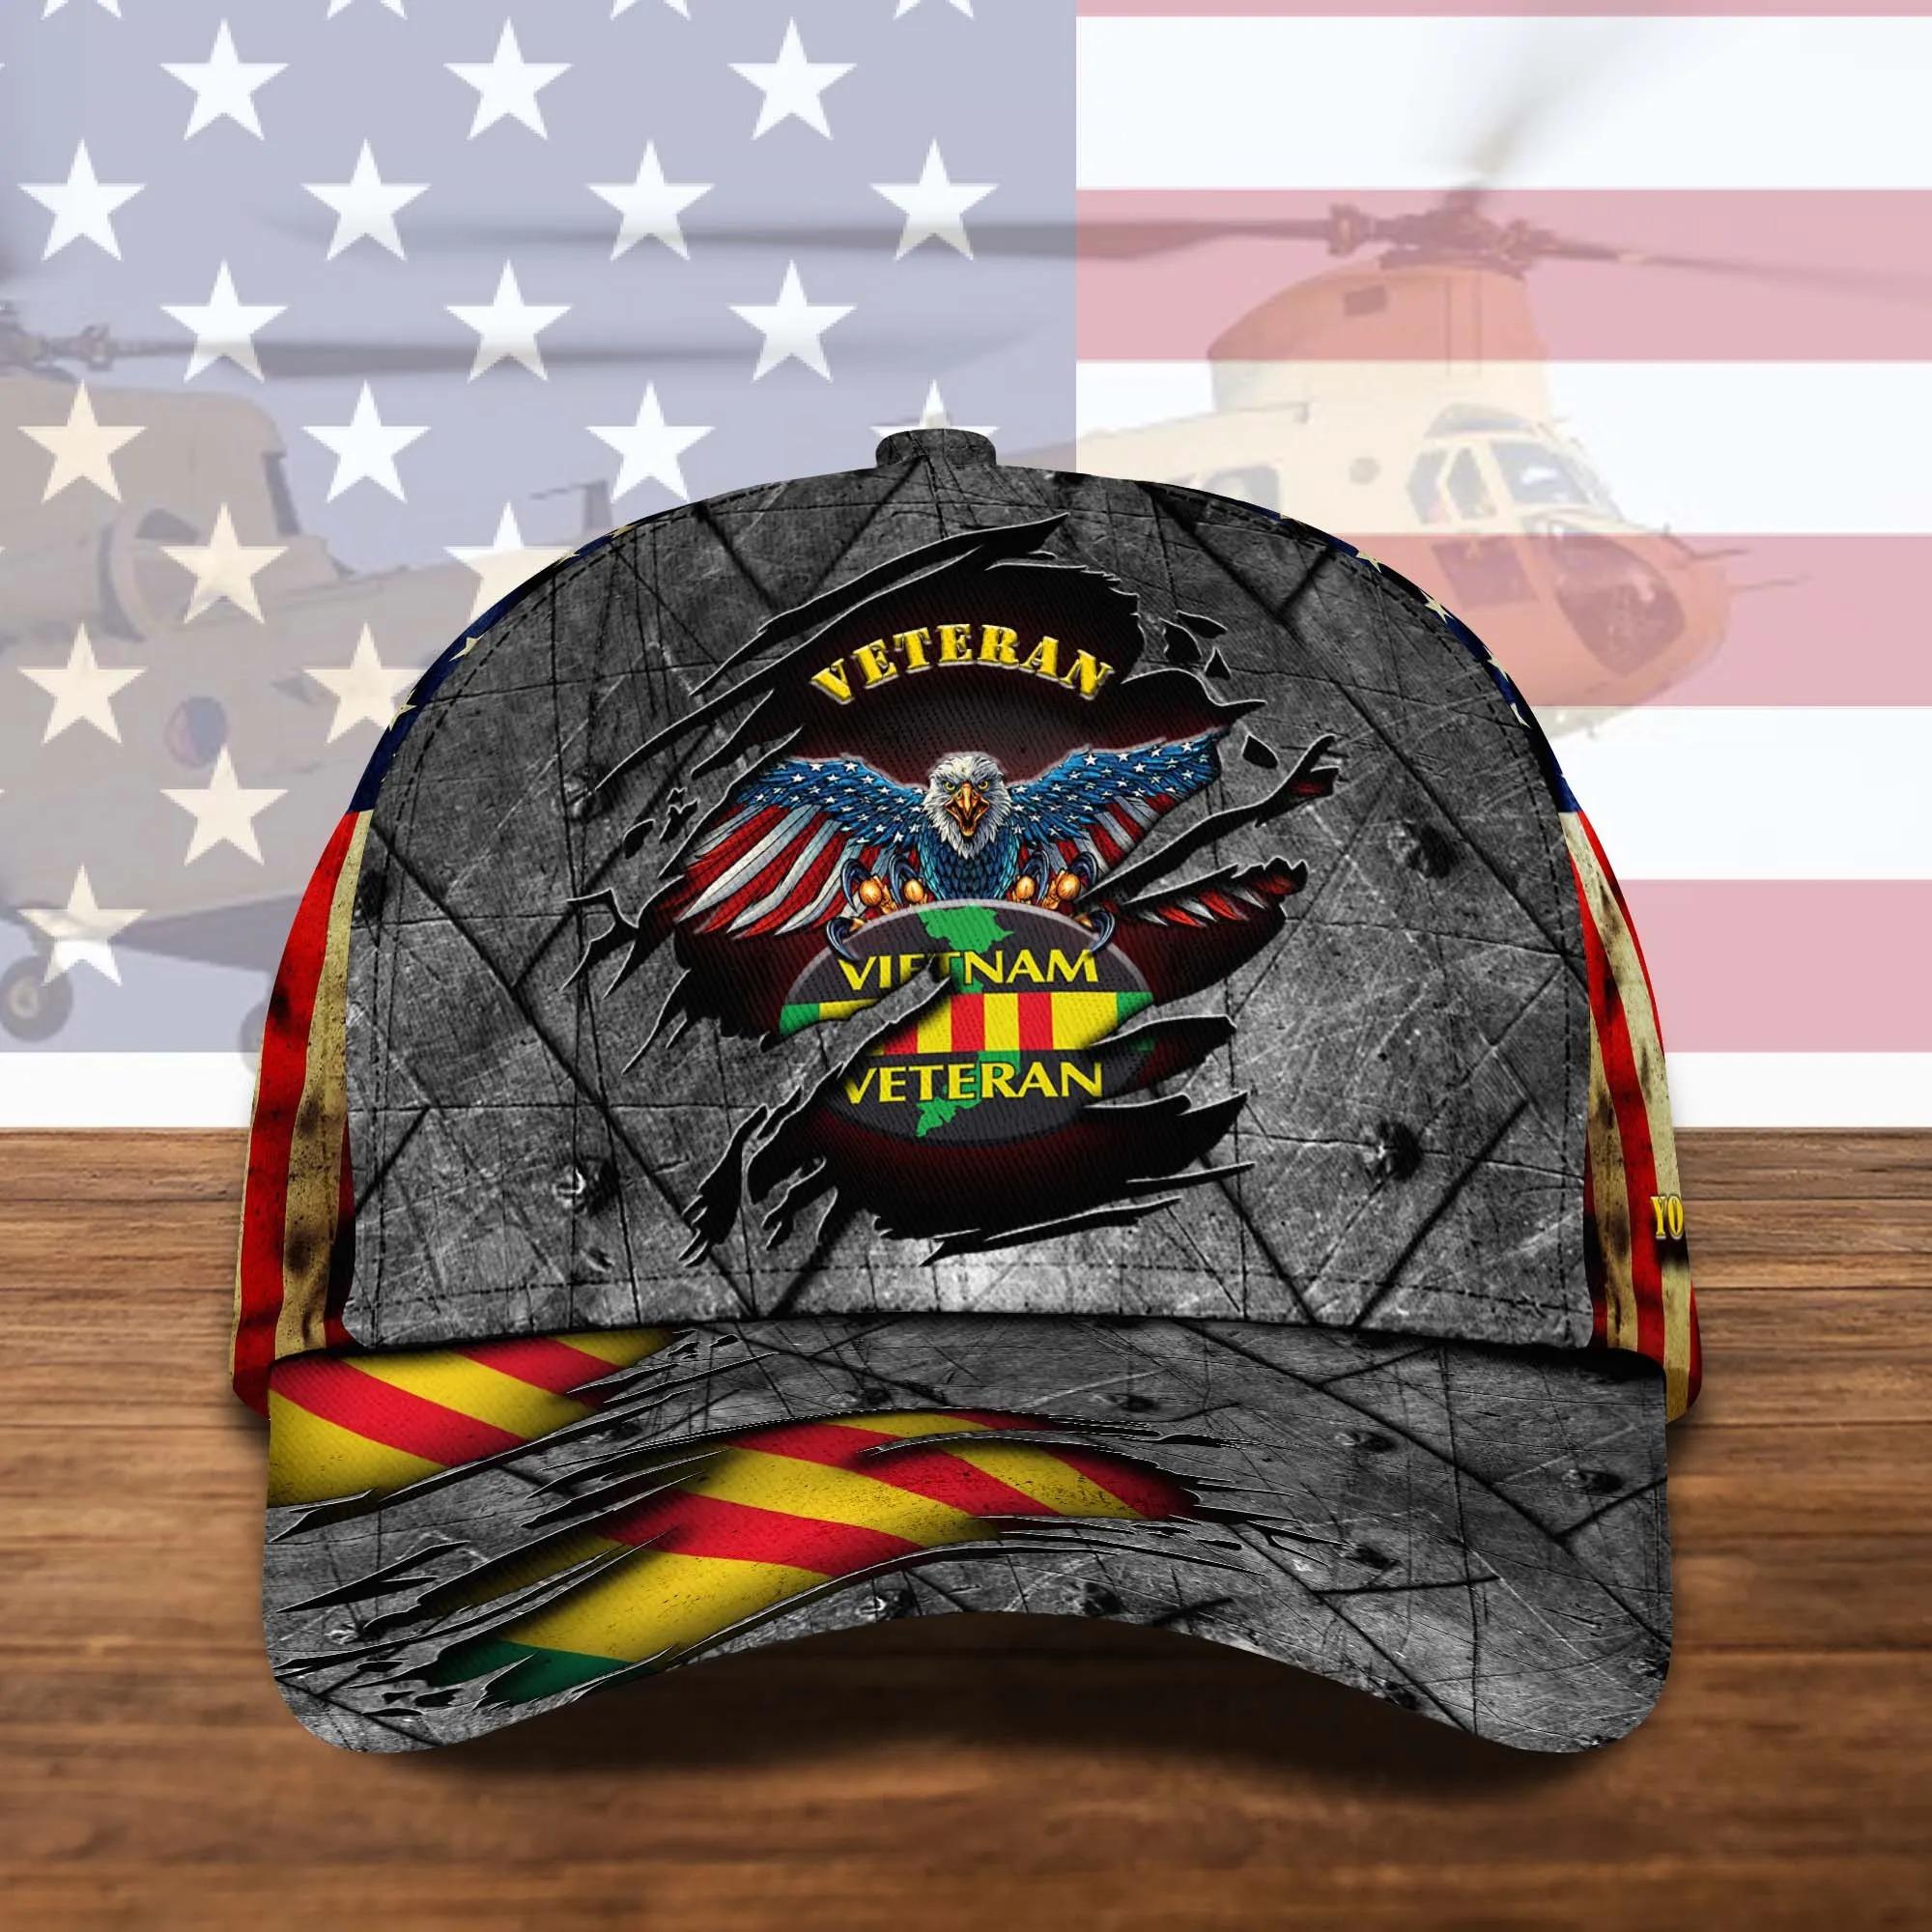 Personalized Name Vietnam Veteran Classic Hat Cap - Hothot 070921